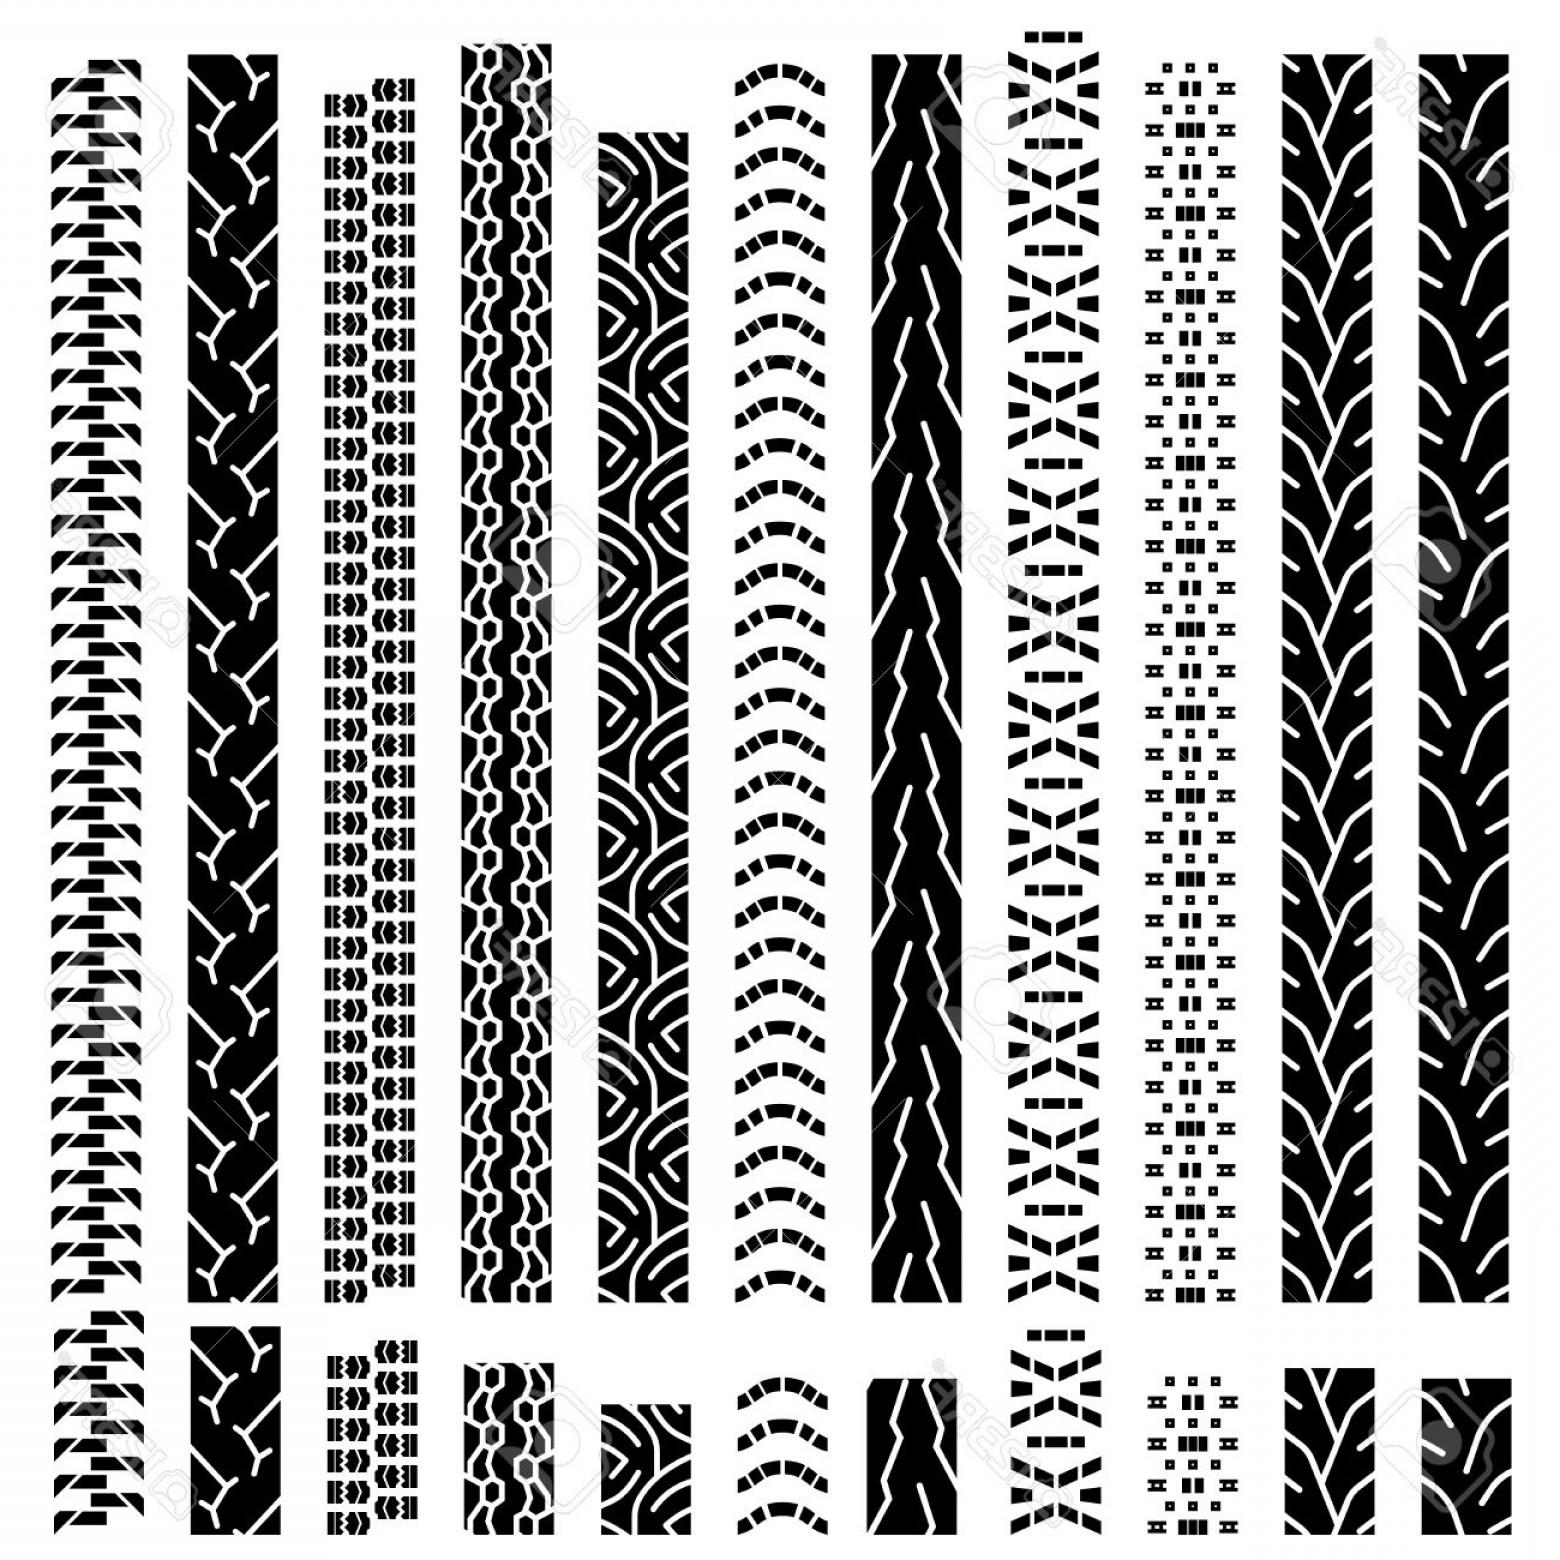 1560x1560 Photostock Vector Collection Textures Of Vector Tire Tracks Tire